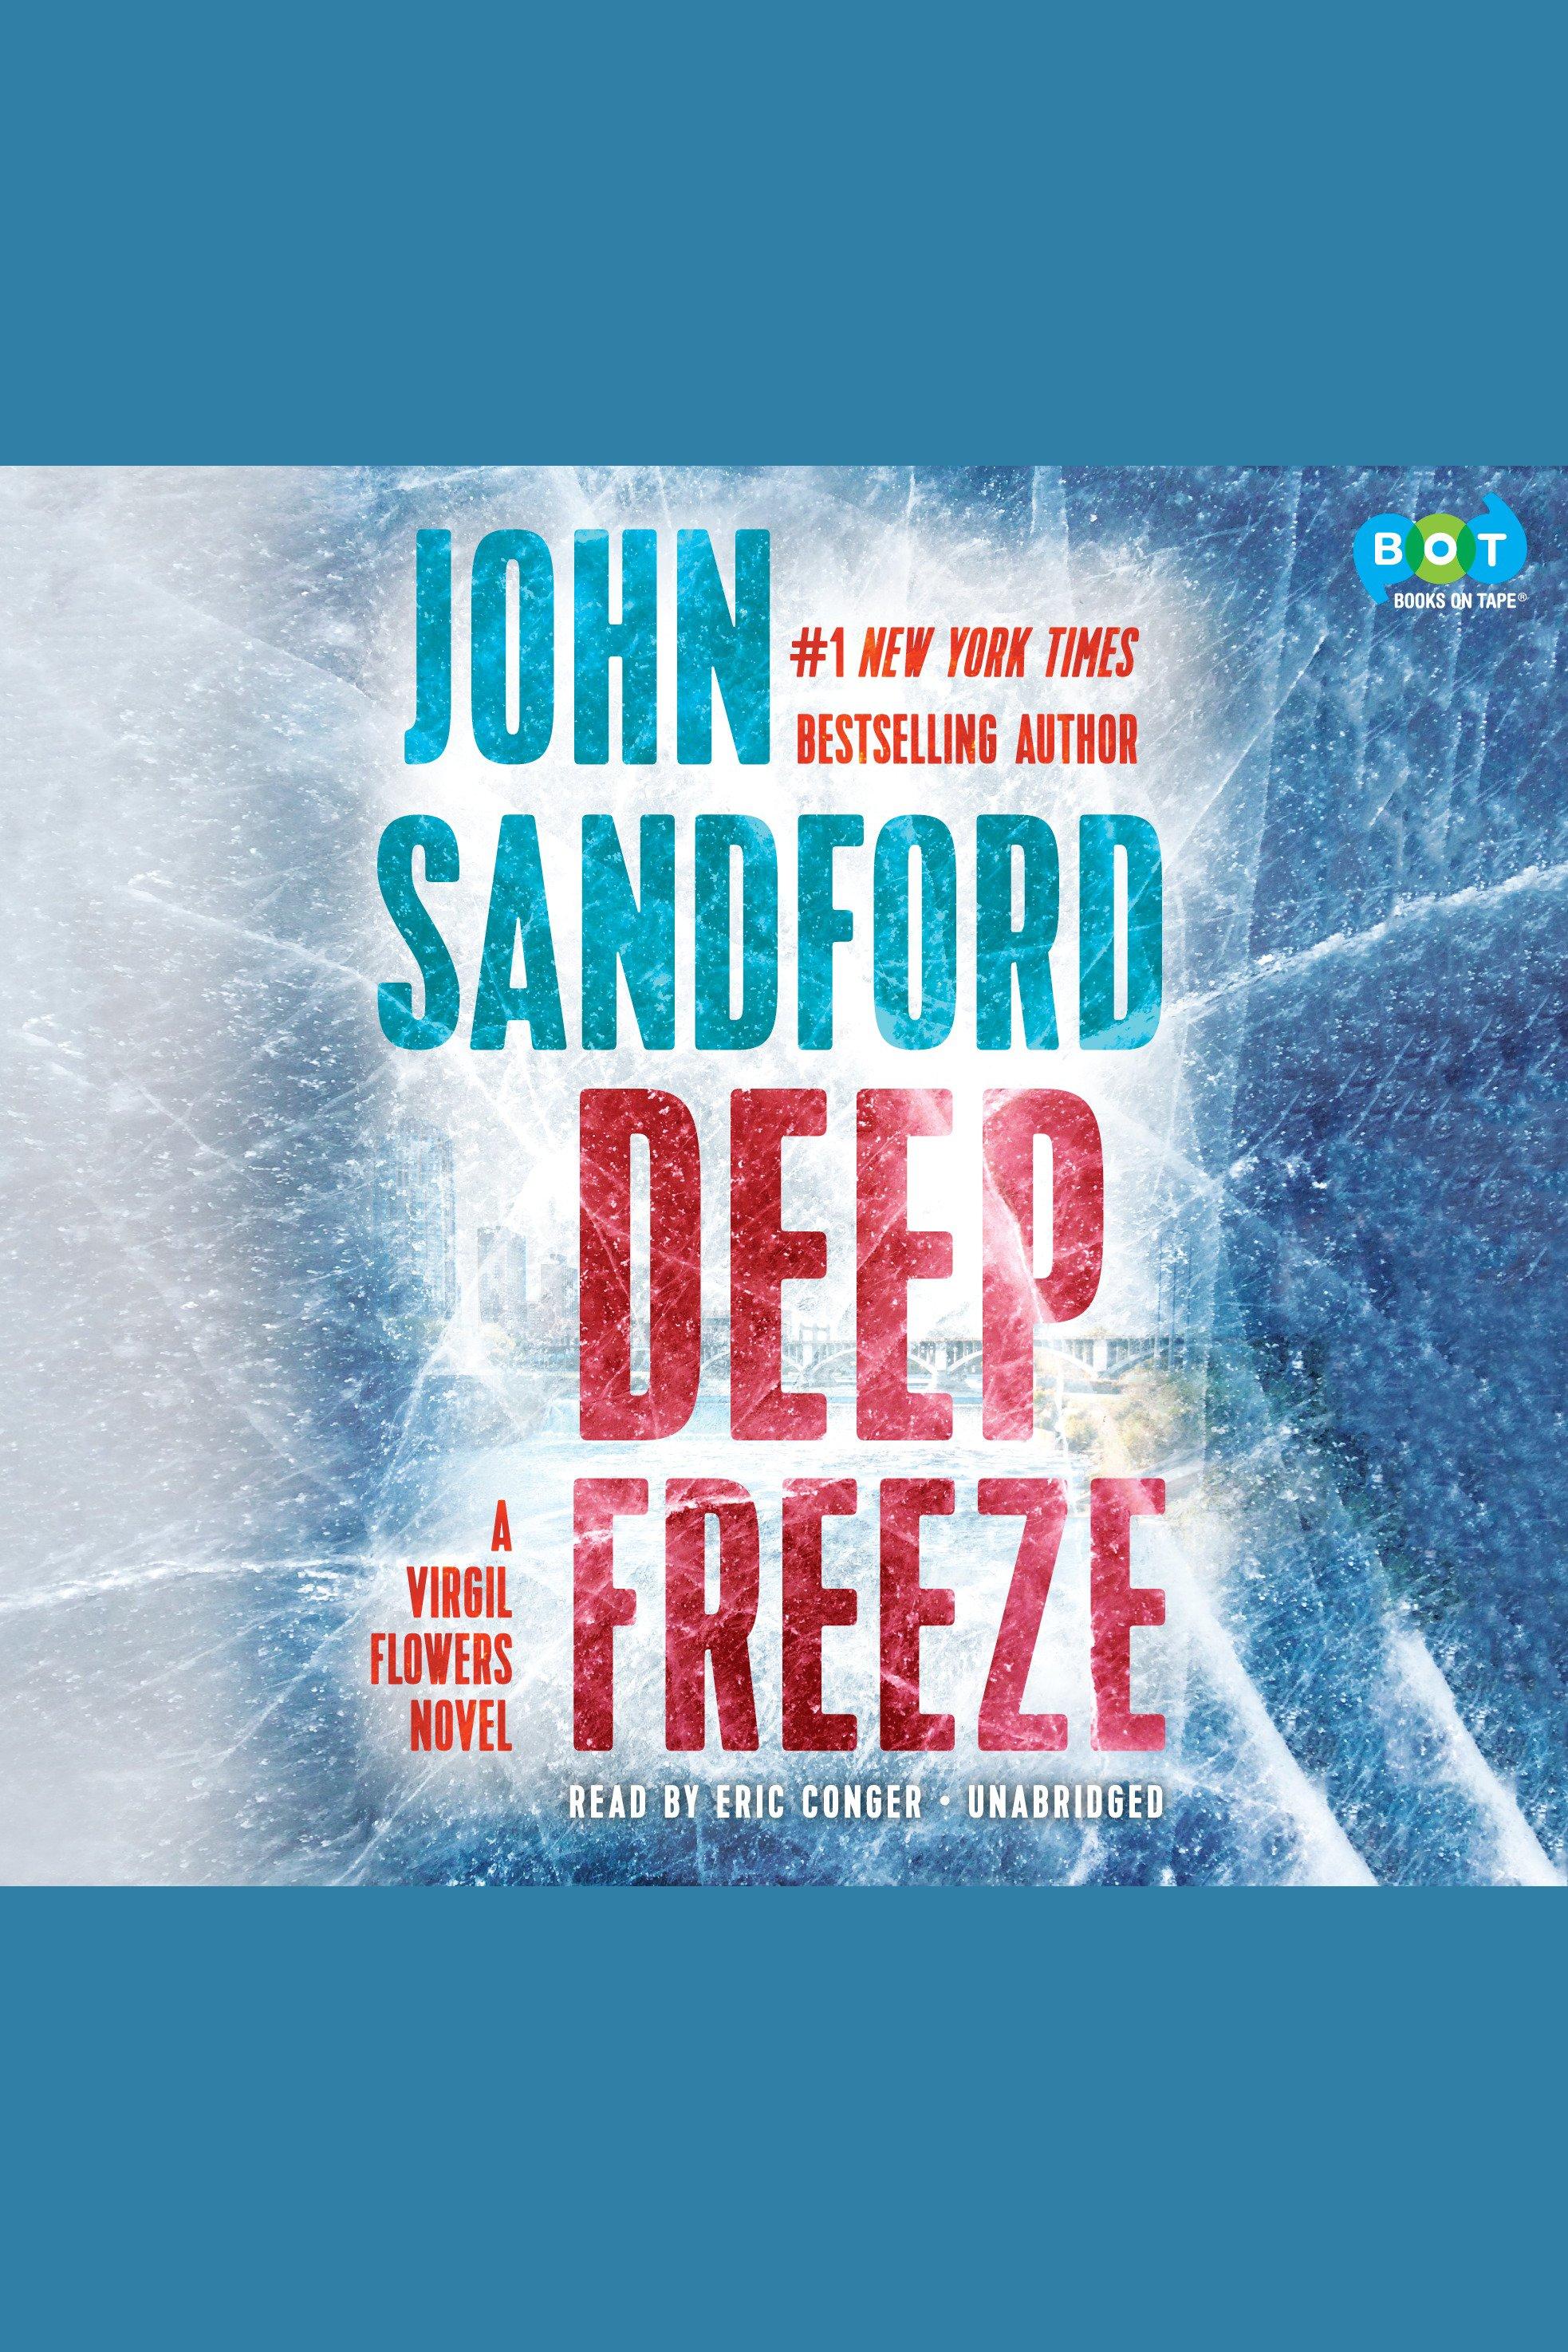 Deep freeze cover image